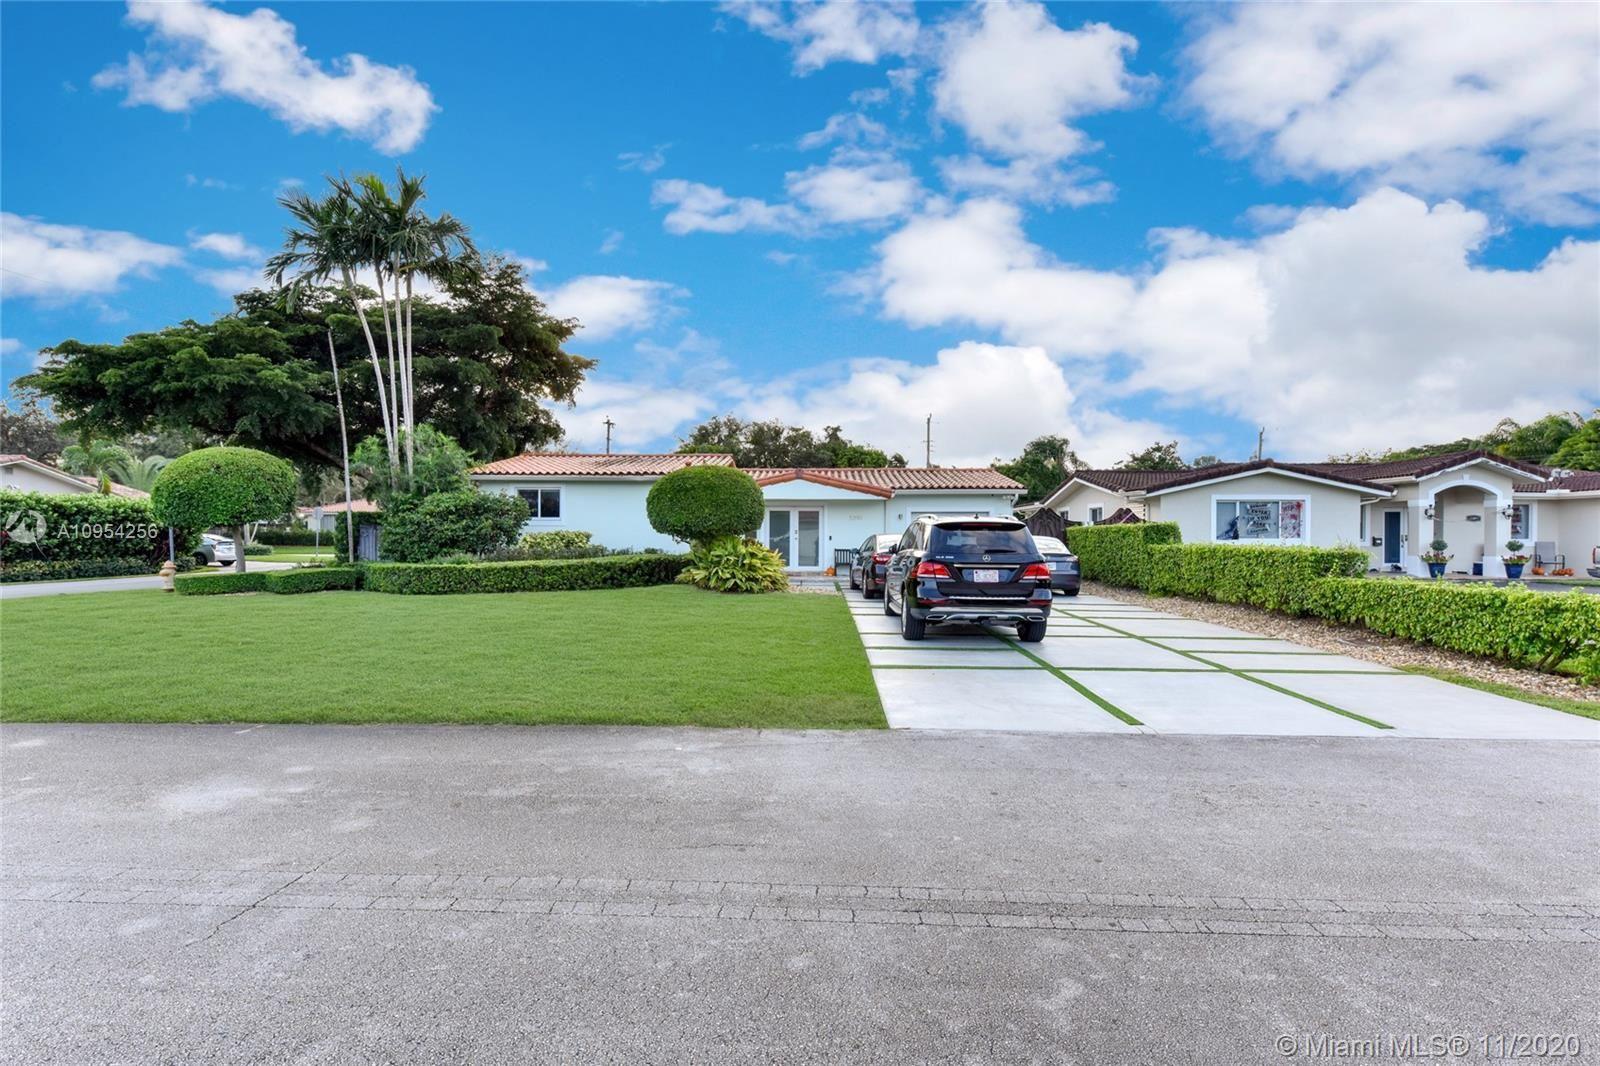 5390 SW 64th Court, South Miami, FL 33155 - #: A10954256